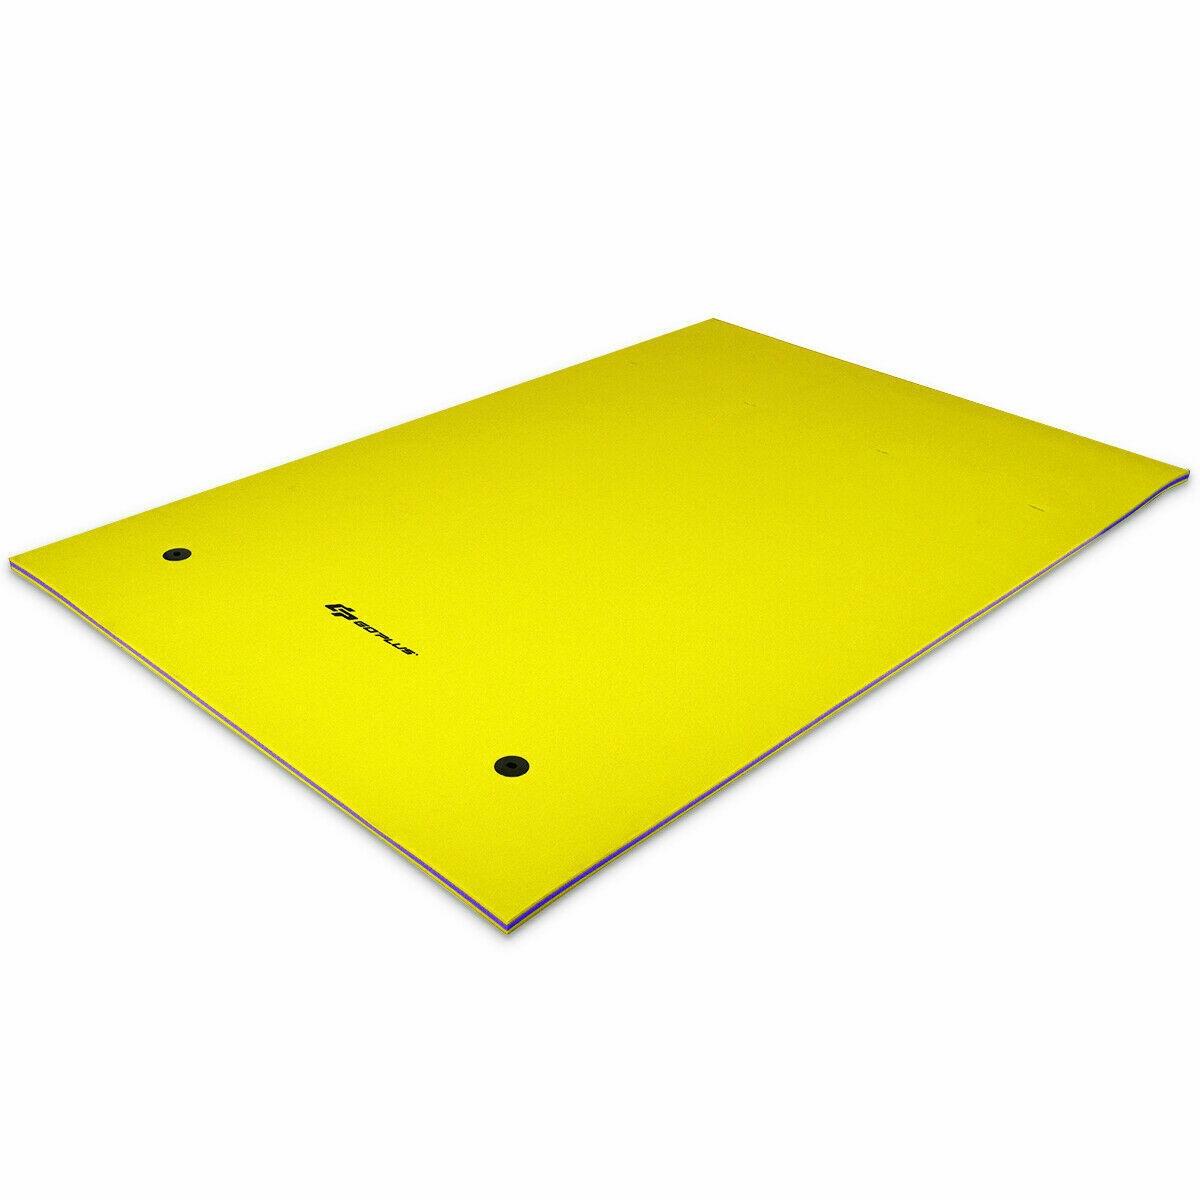 9' x 6' 3 Layer Floating Oasis Water Pad Foam Mat